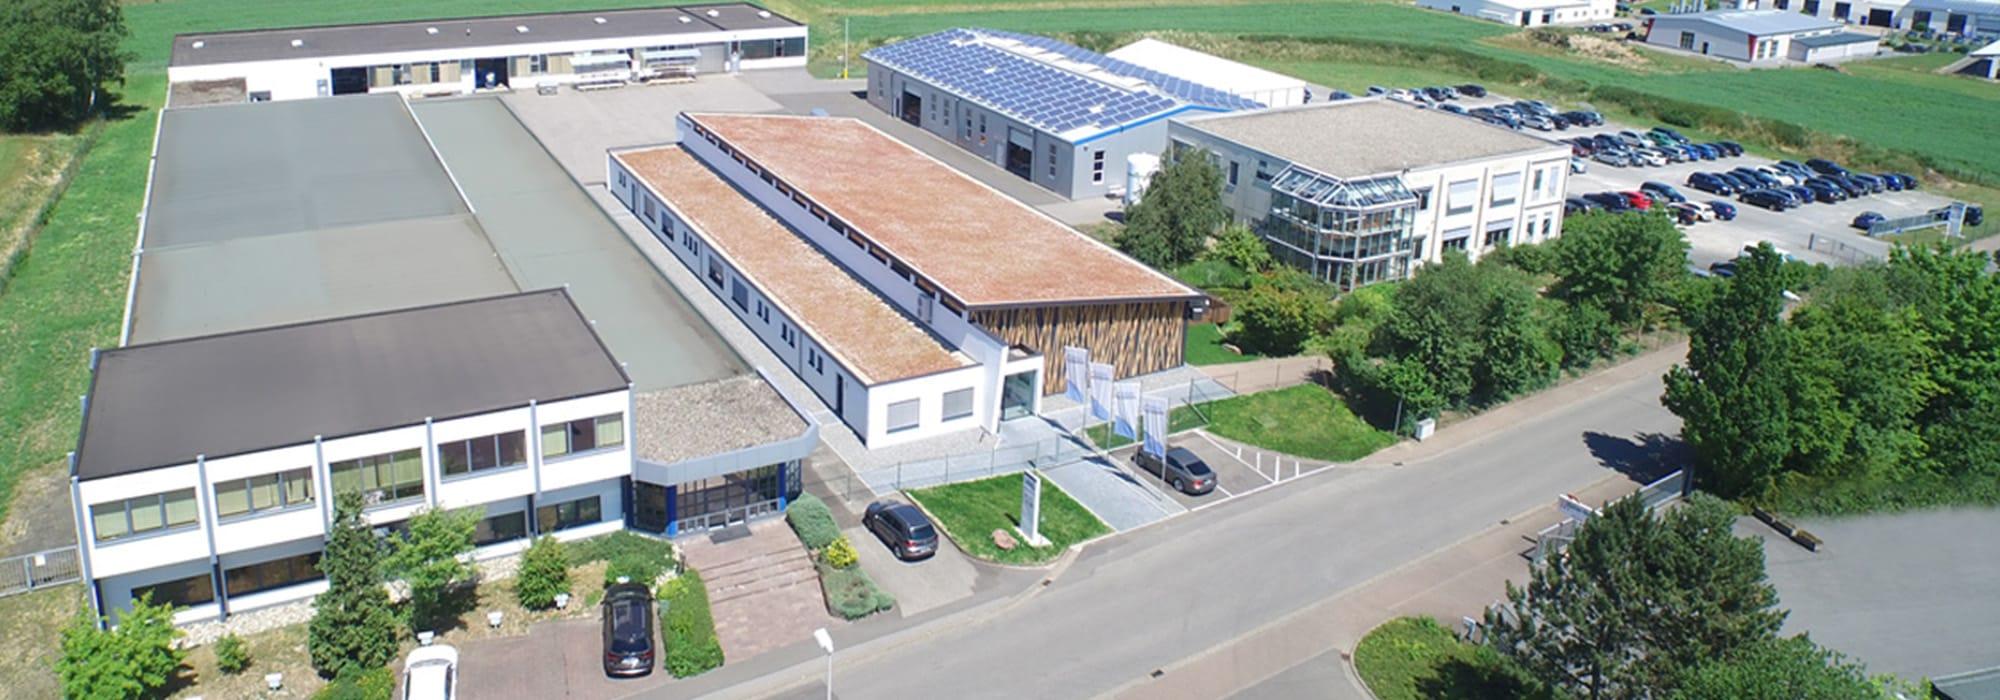 Seho Systems GmbH